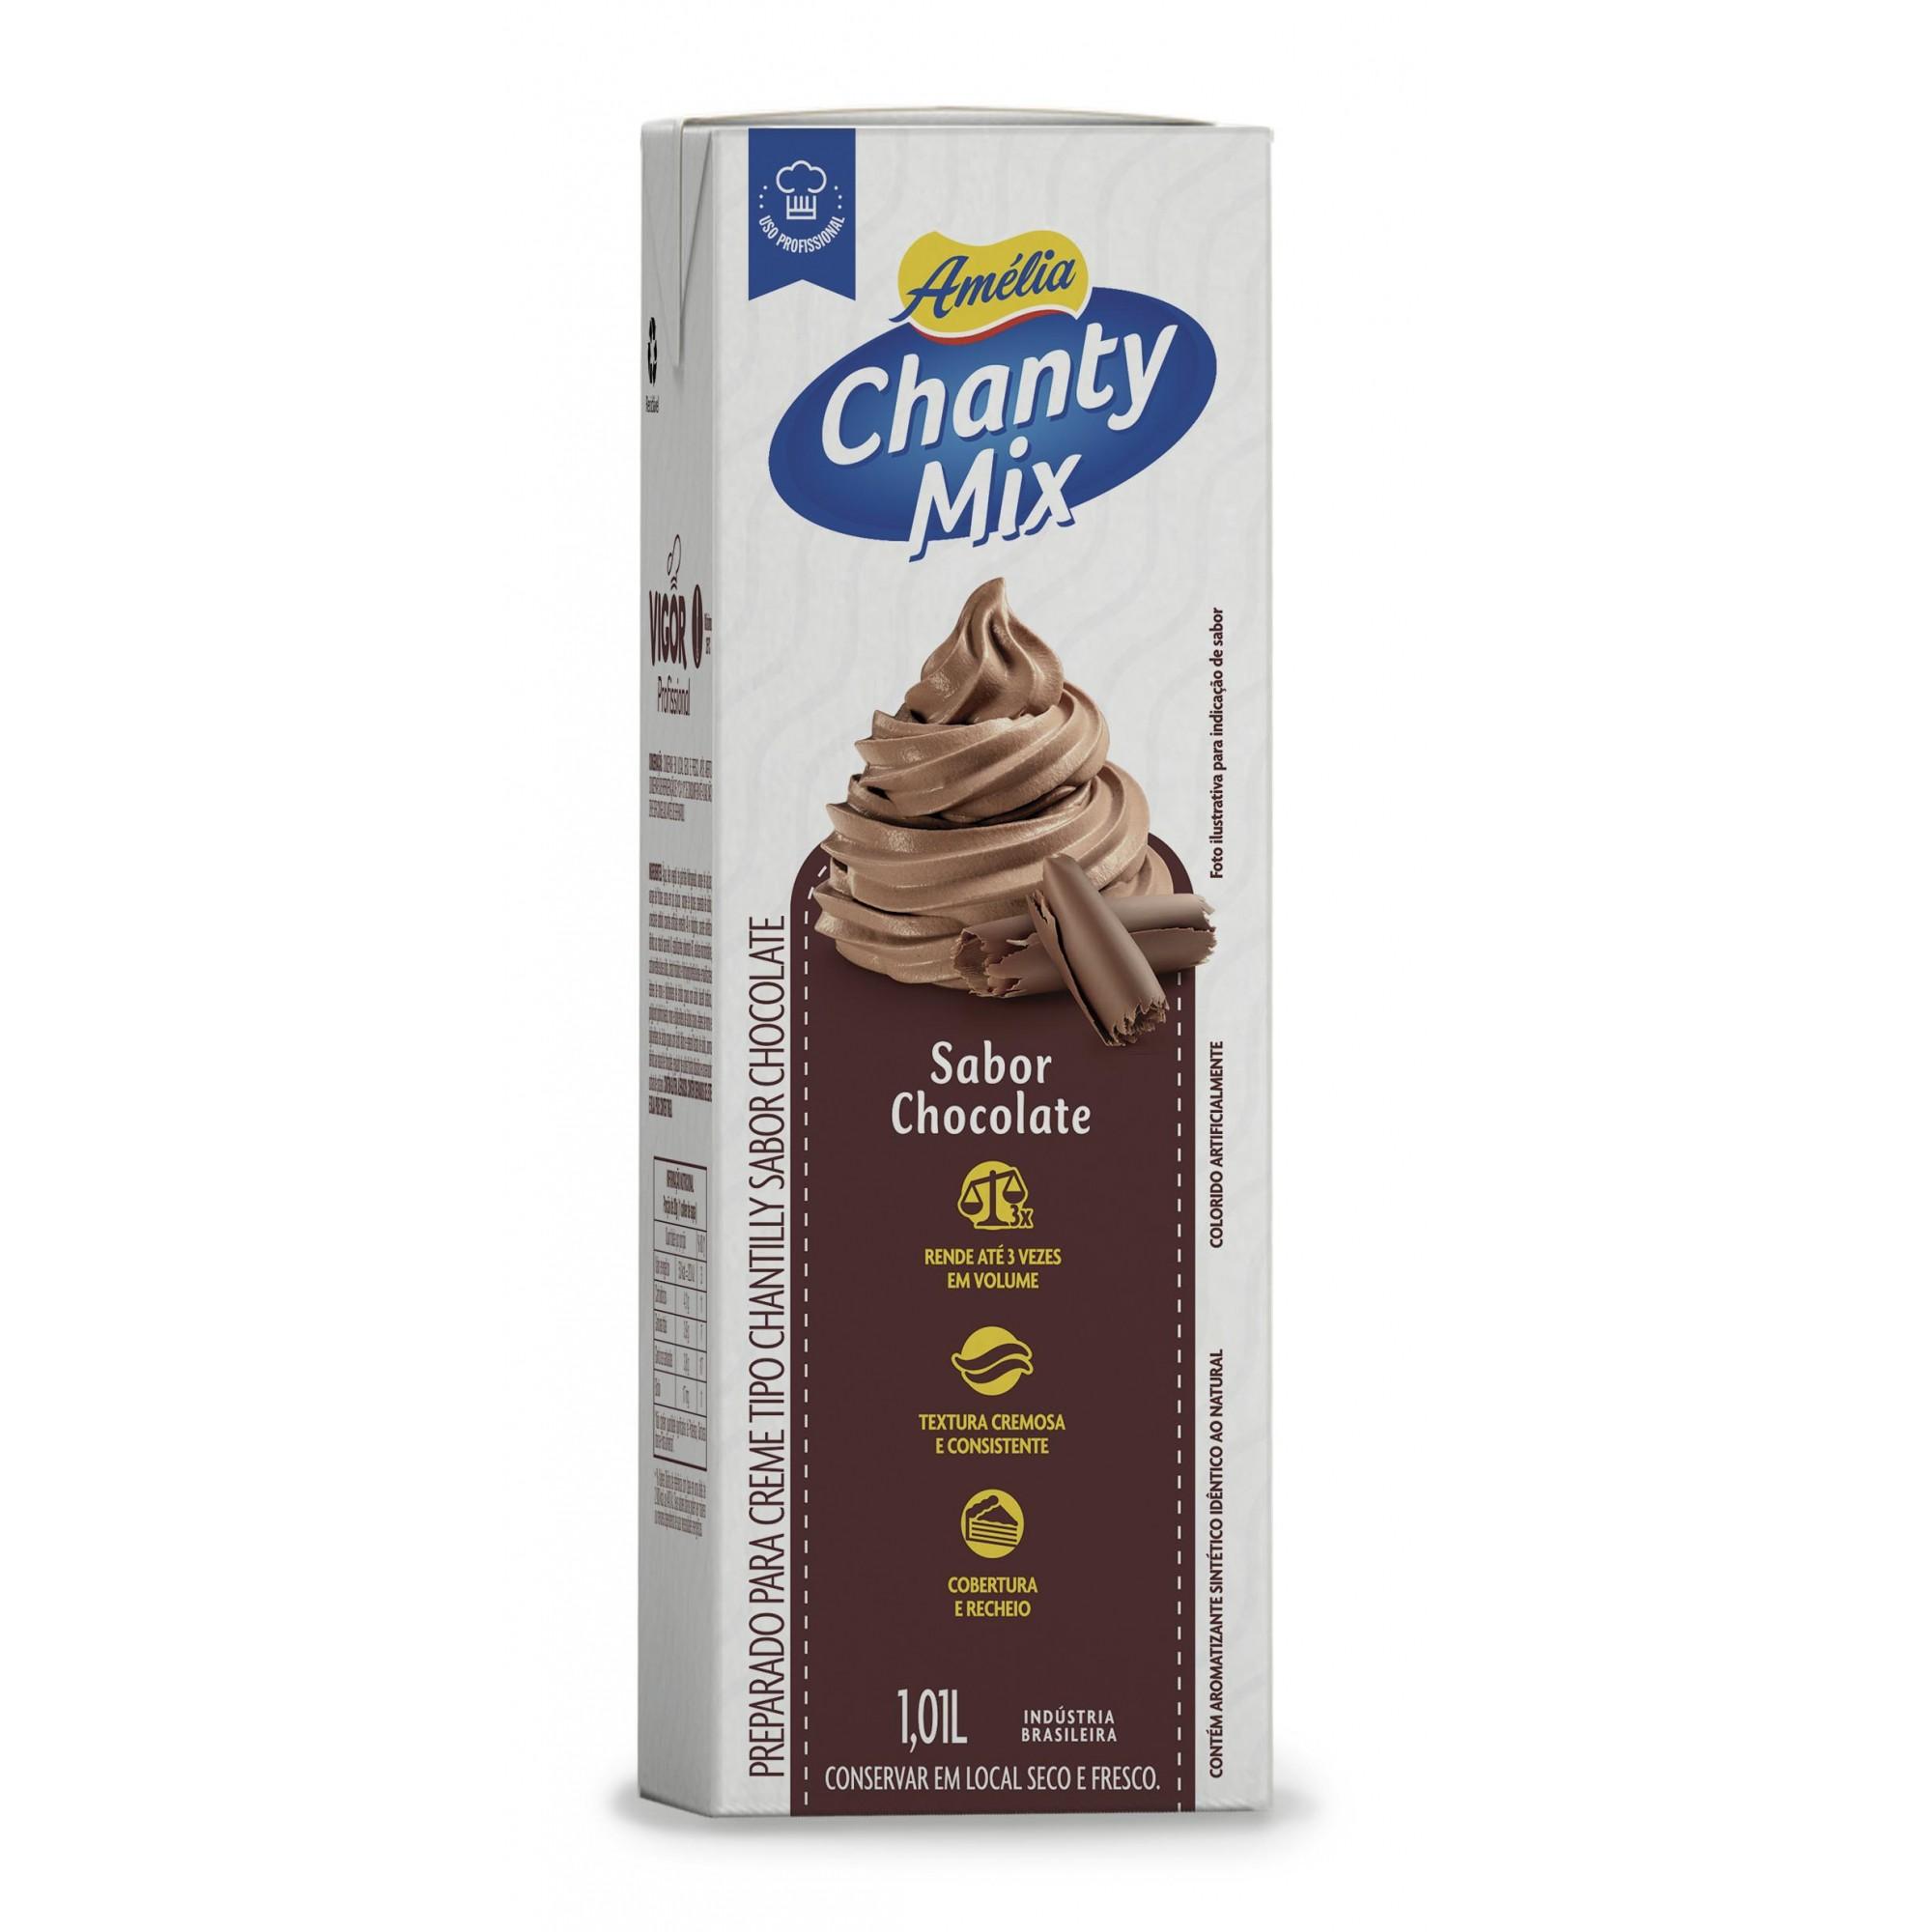 VIGOR - CHANTILLY AMELIA 1KG CHOCO MIX